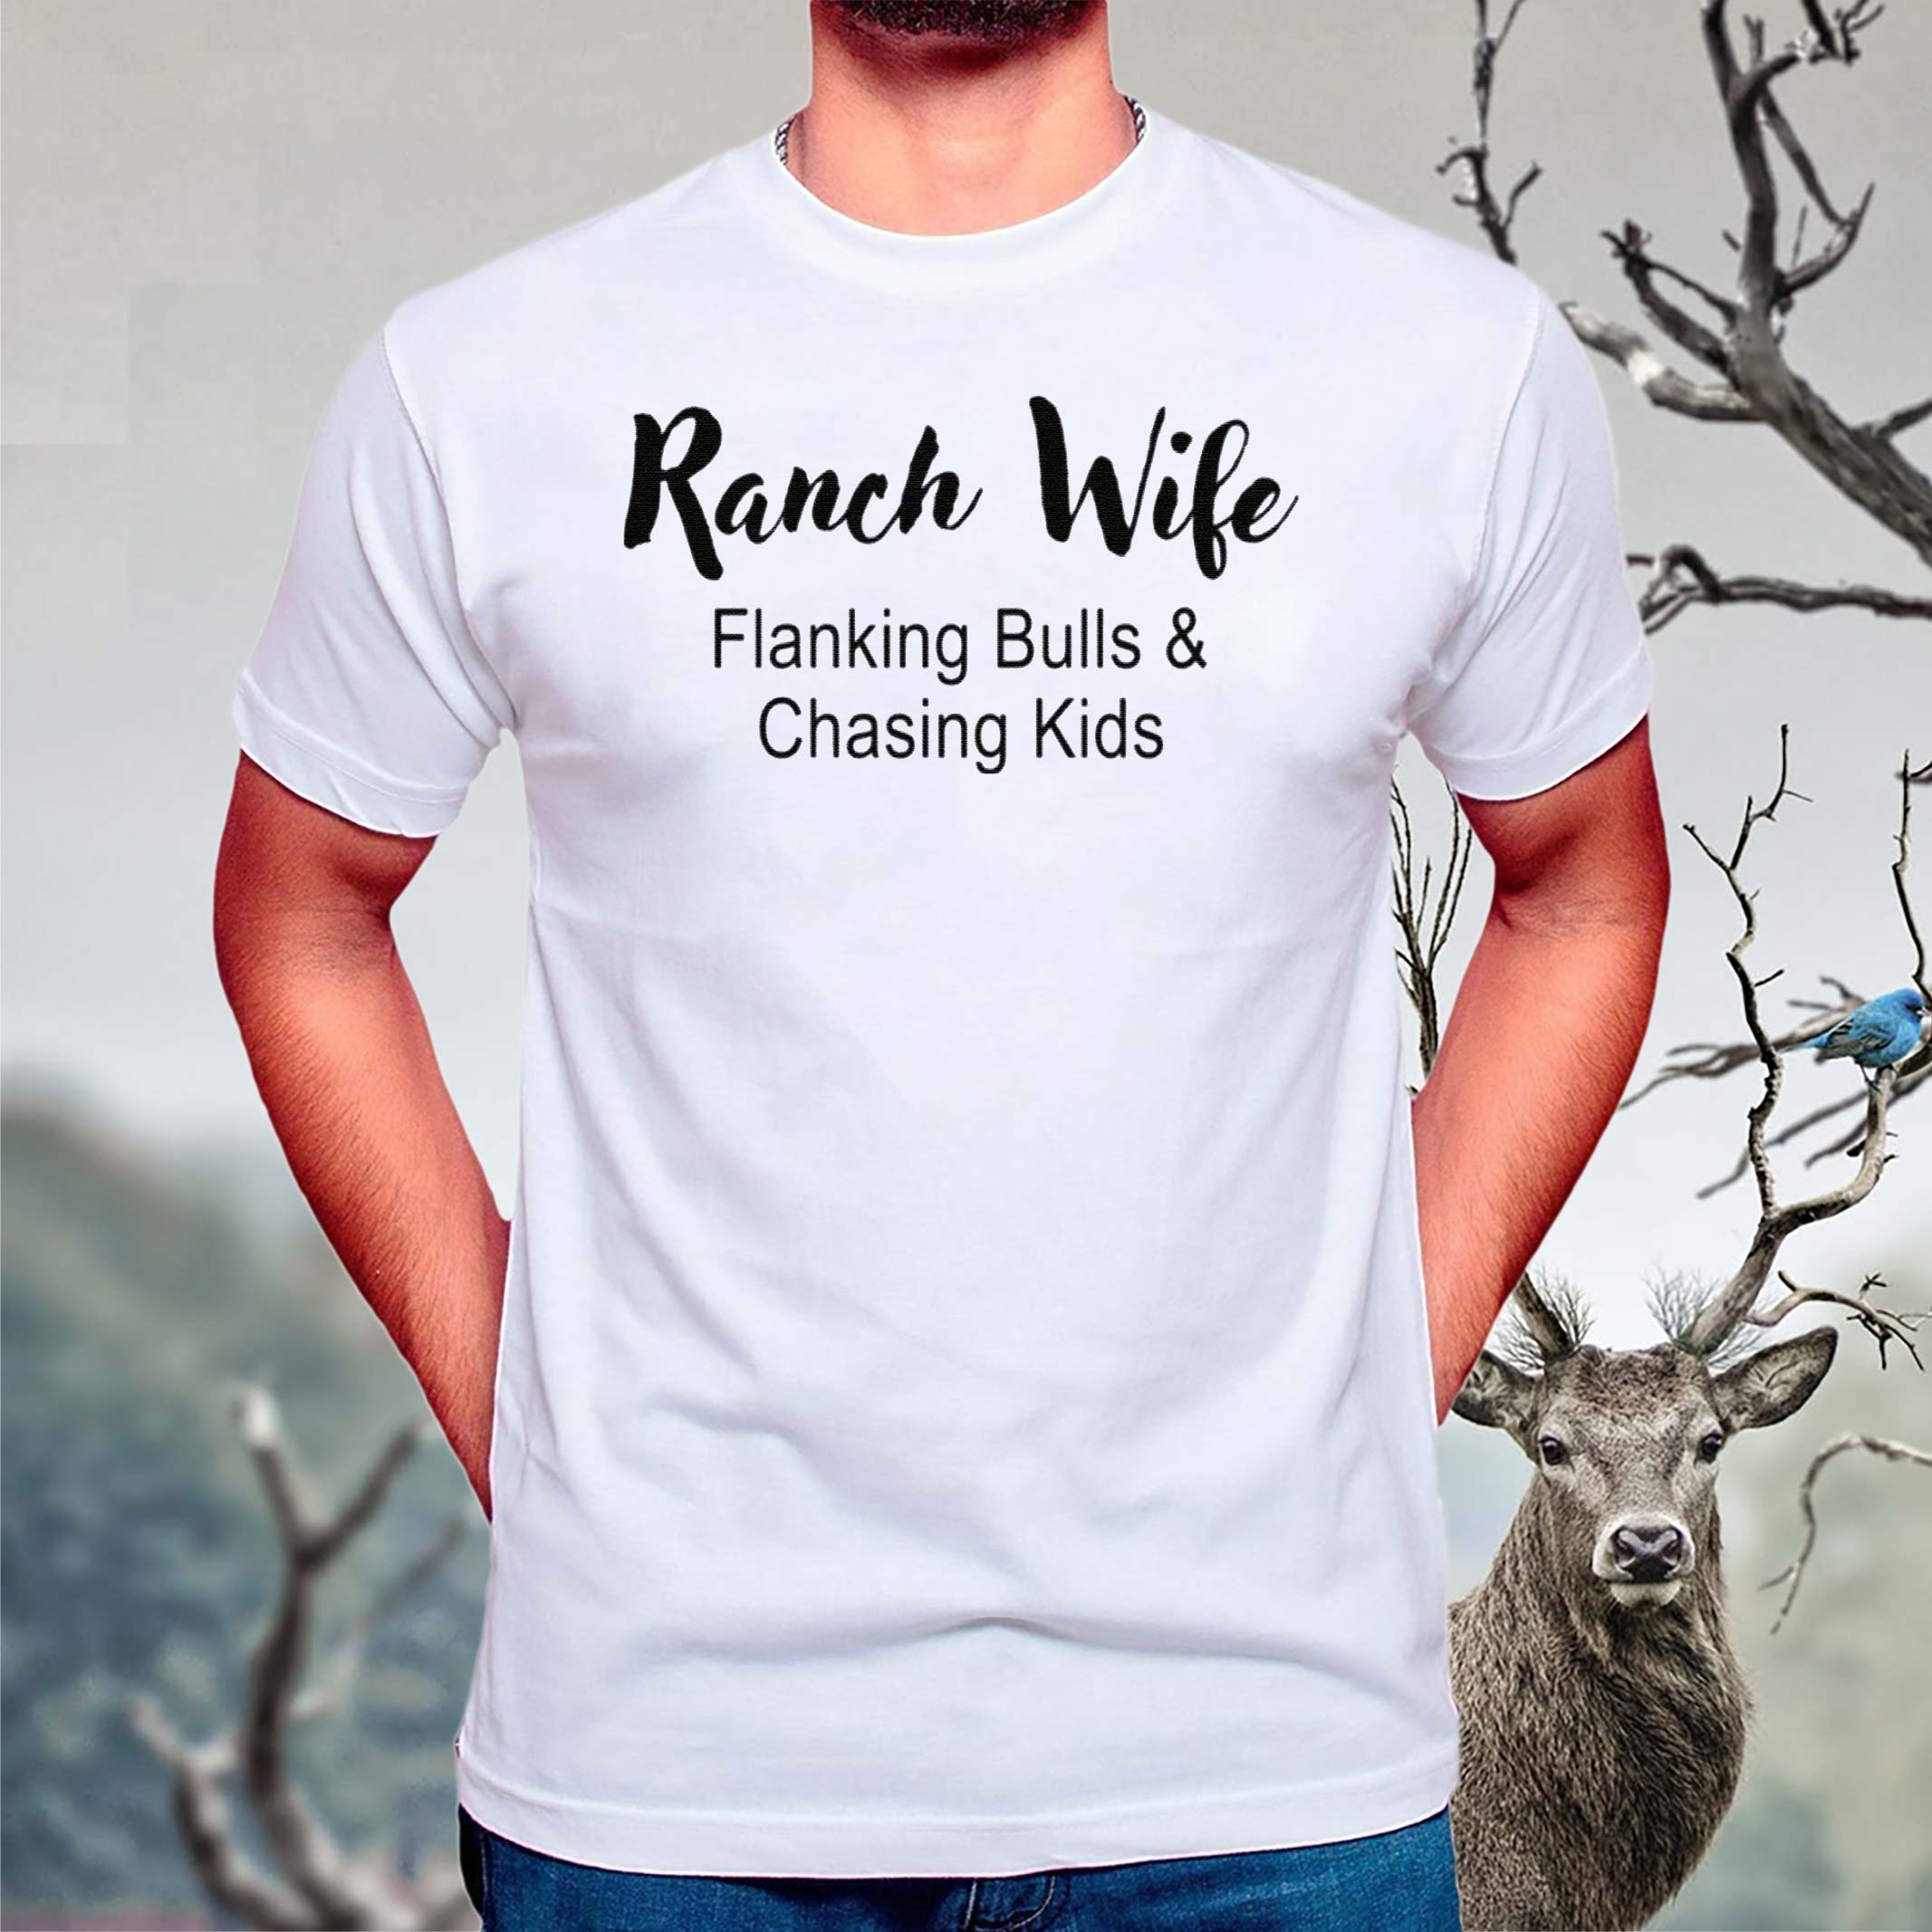 Ranch-Wife-Flanking-Bulls-Chasing-Kids-shirt